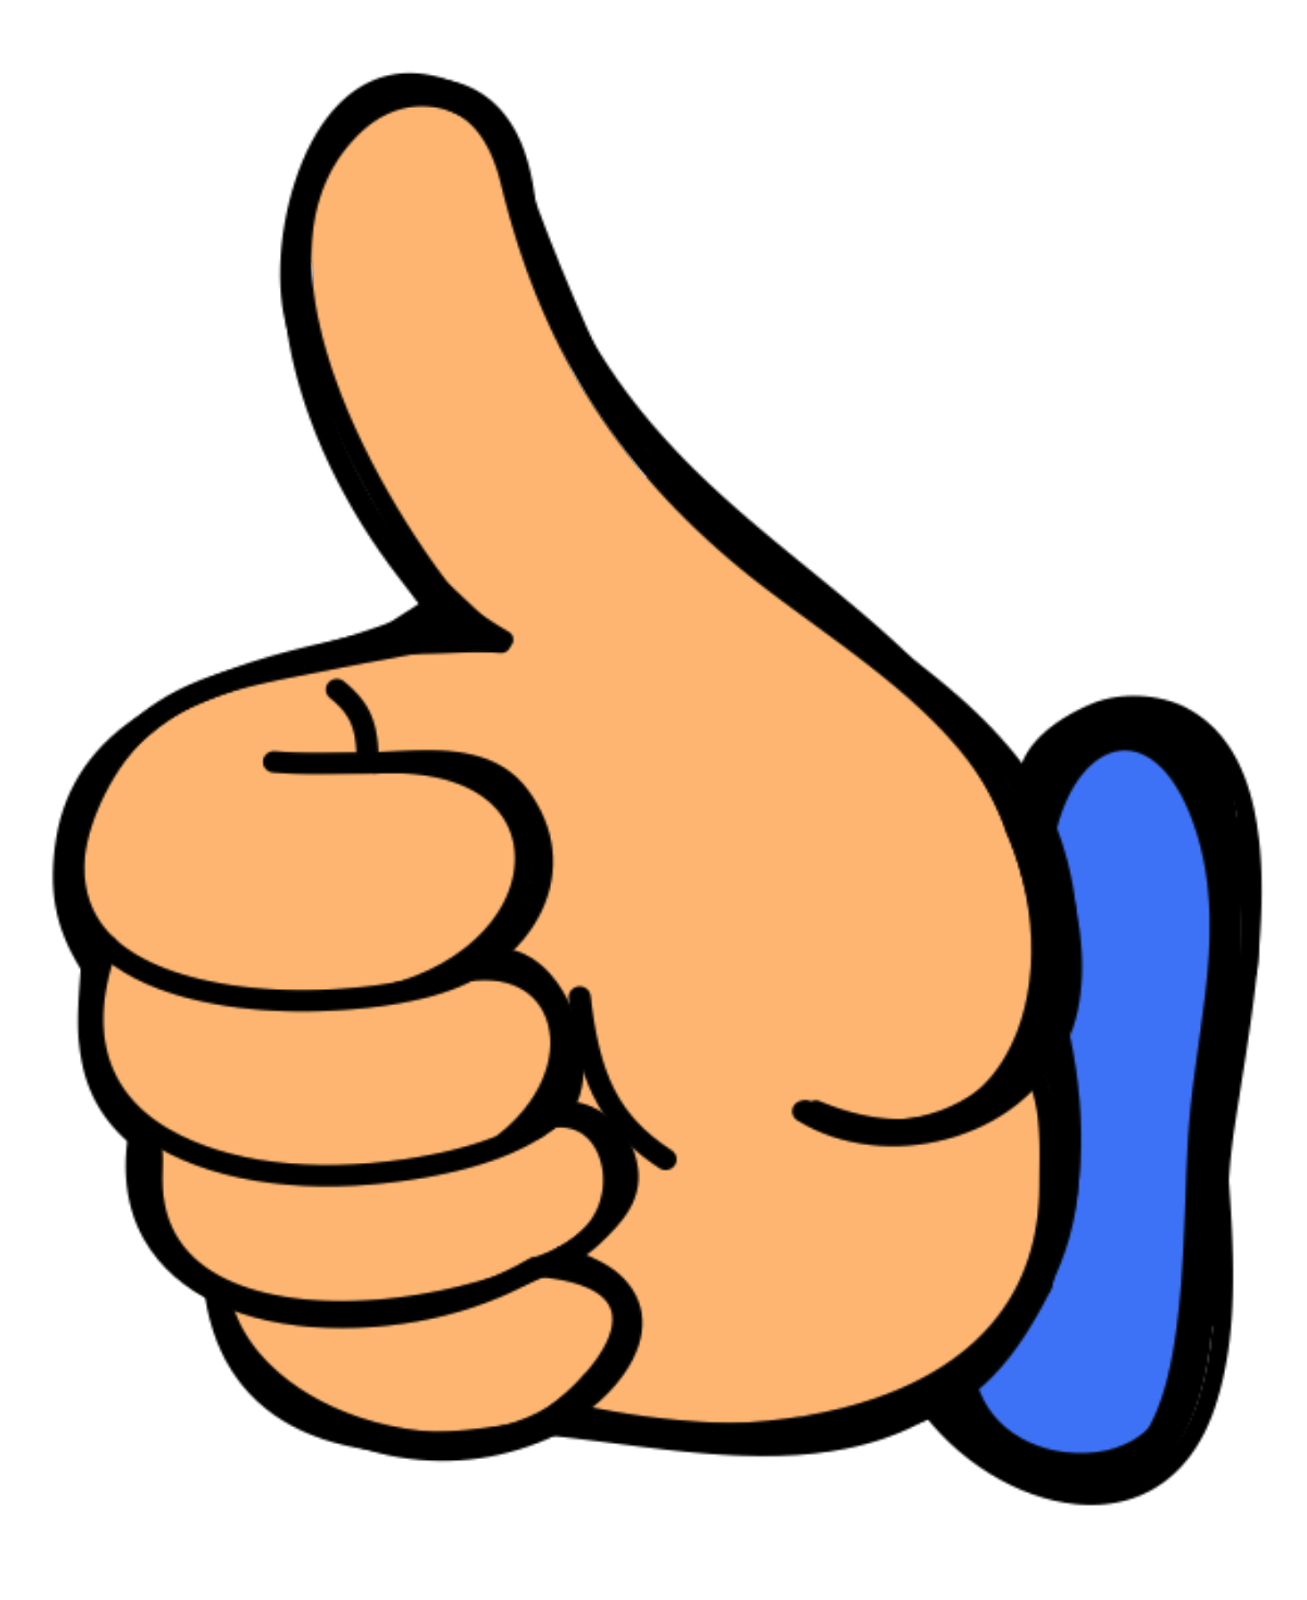 Mandurah police on twitter. Thumb clipart thumb finger